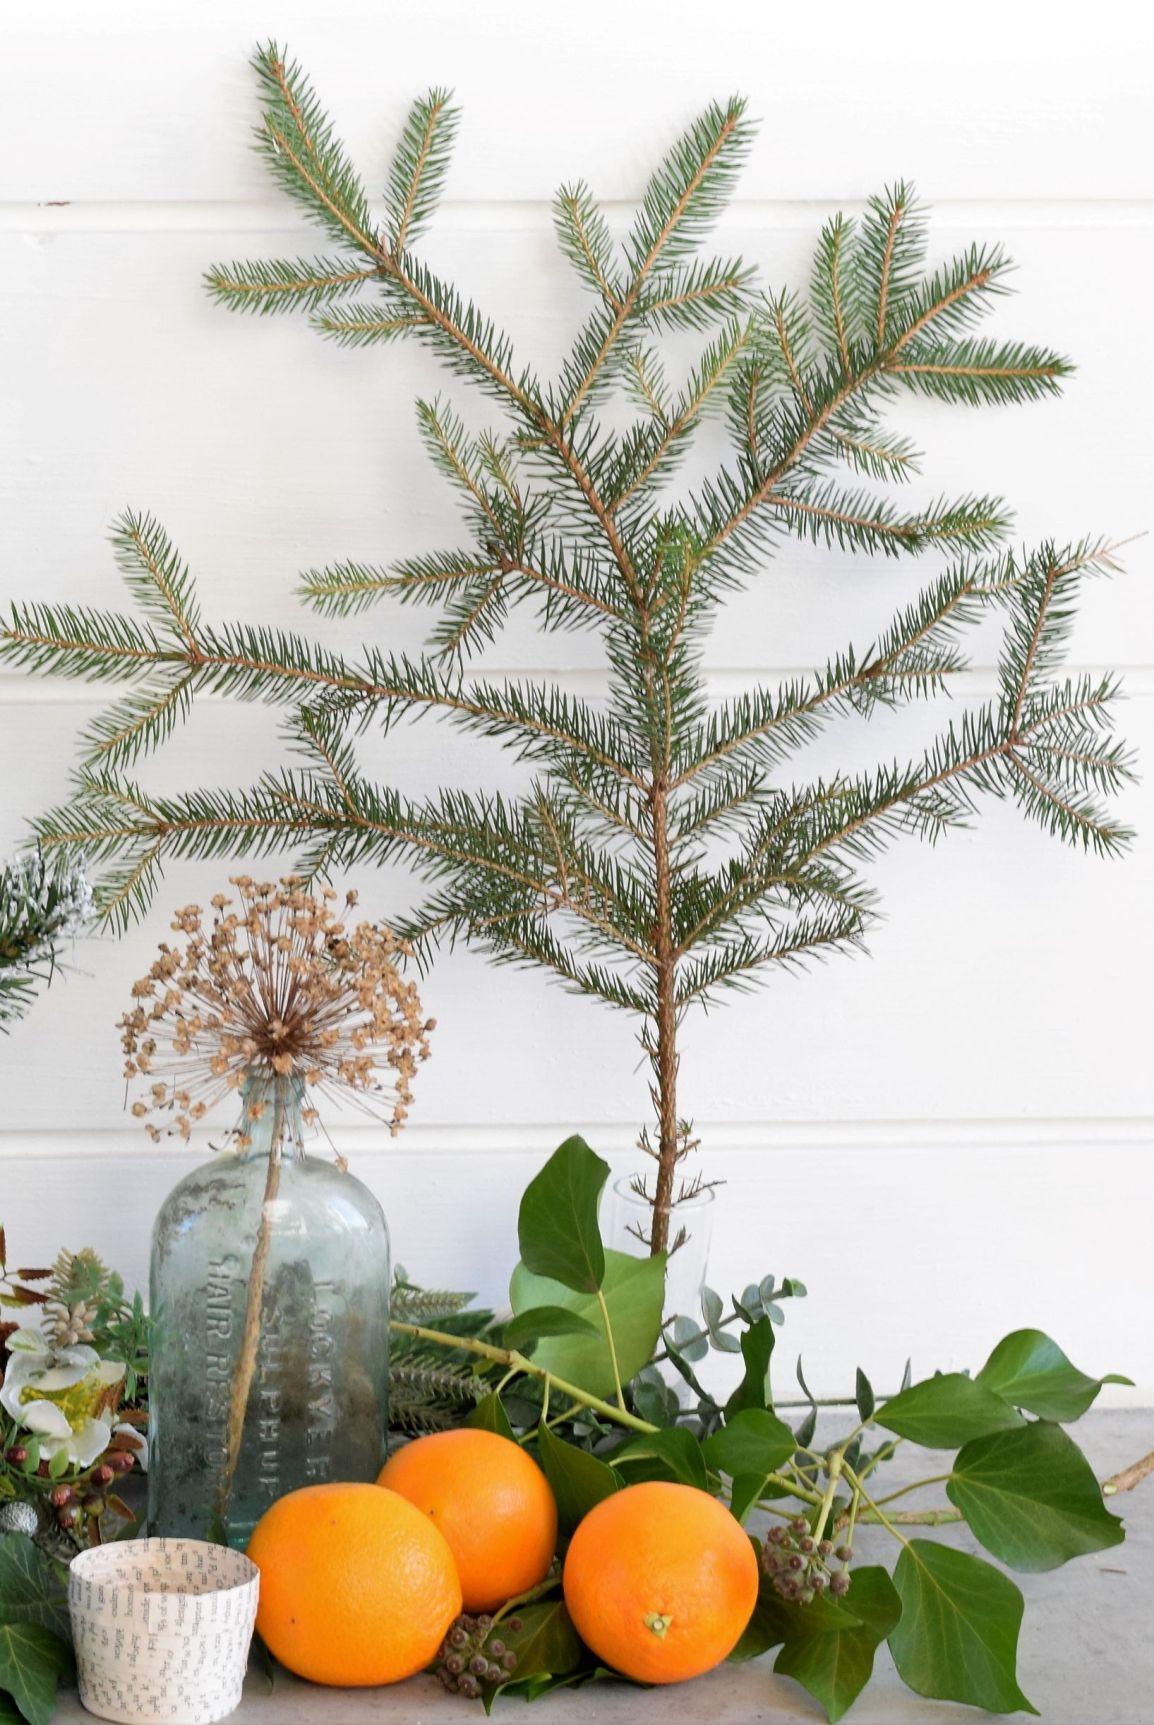 Christmas tree, seedhead, ivy and oranges